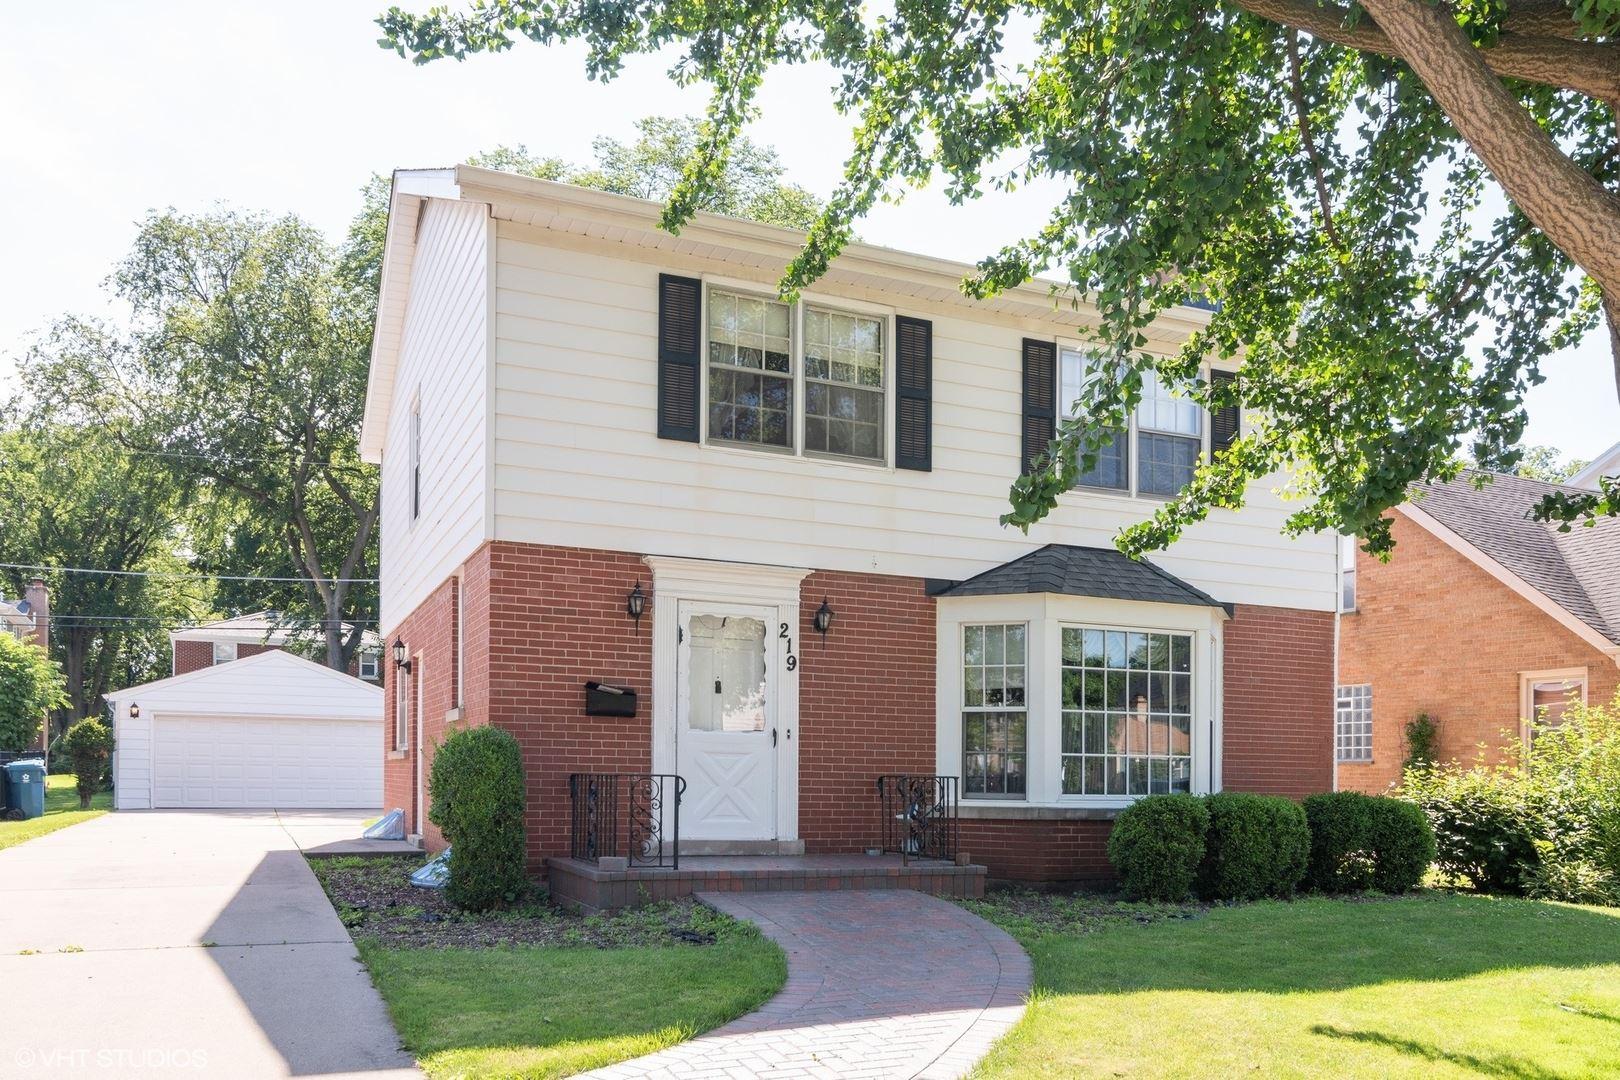 219 S Hawthorne Avenue, Elmhurst, IL 60126 - #: 10782512